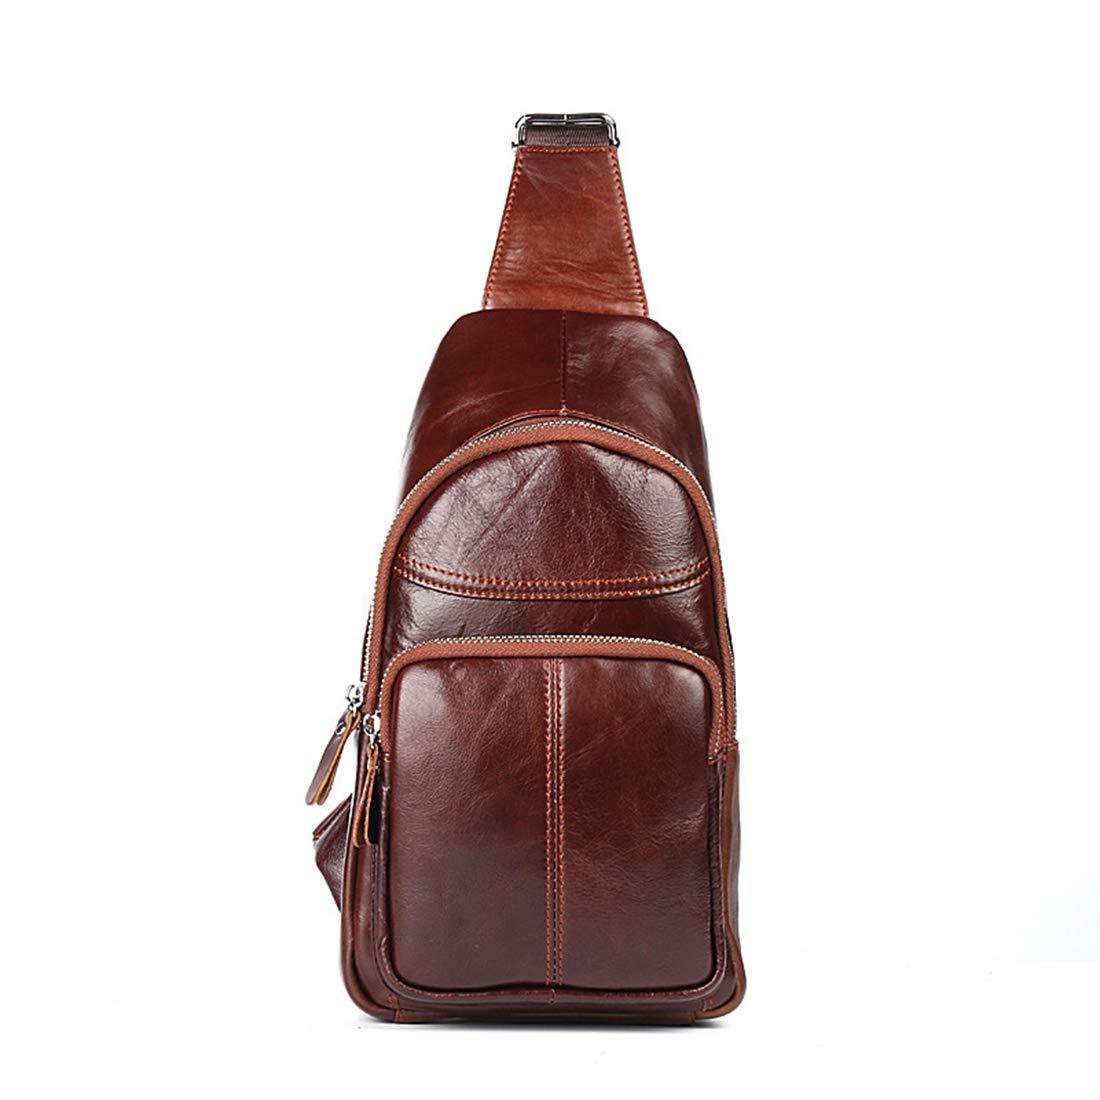 Carriemeow 本革 メンズ チェストバッグ レジャー ウエストバッグ ユース バッグ 旅行 バックパック ショルダーバッグ (色:写真カラー) B07L5MKKMP